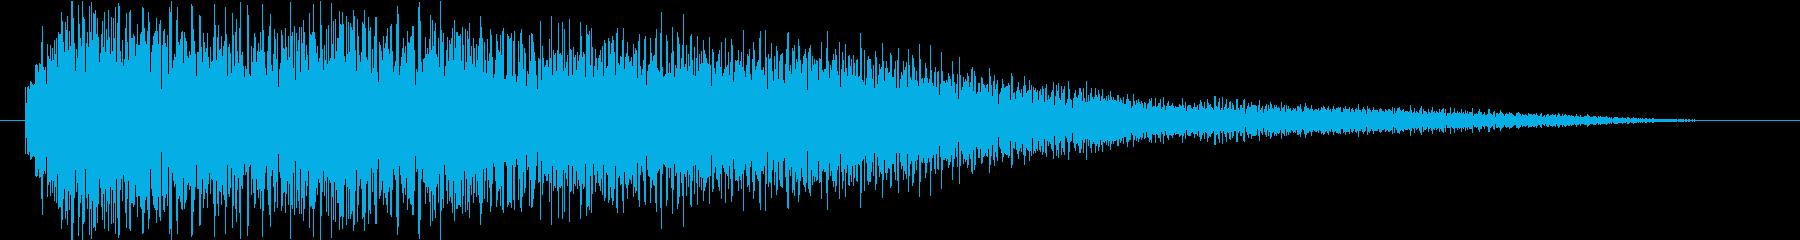 Excellent sound logo, floating and transparent feeling's reproduced waveform